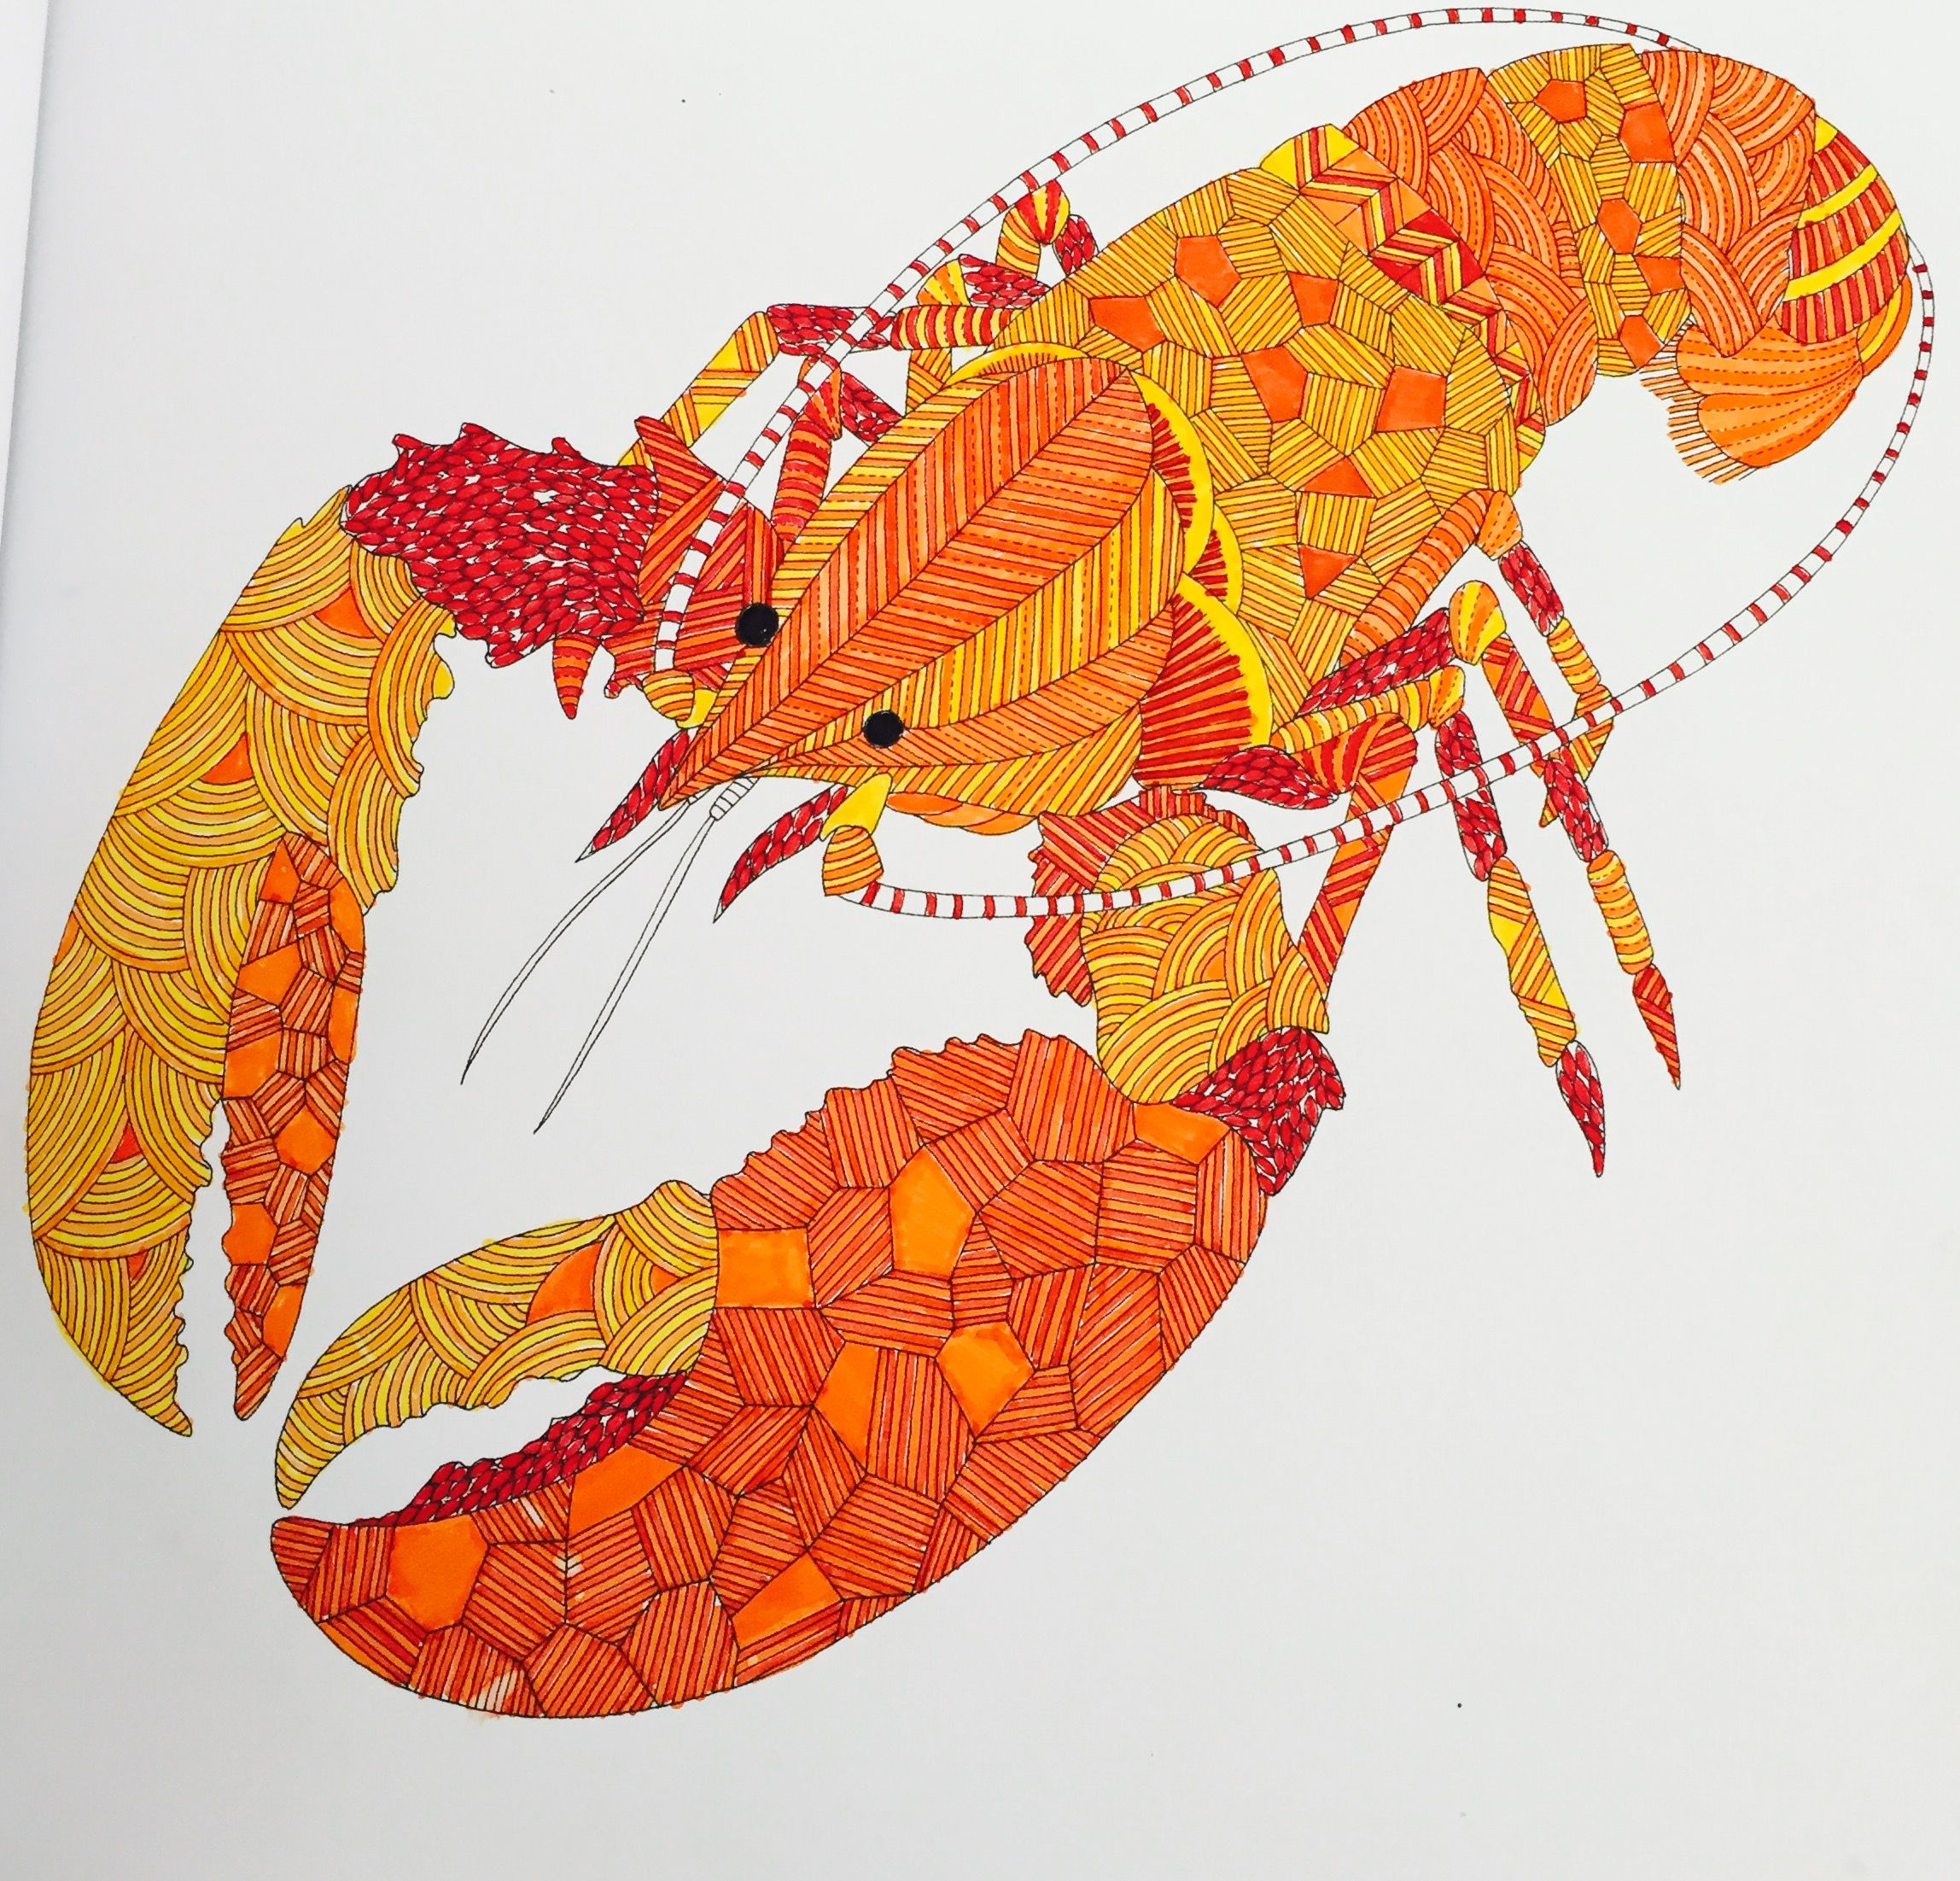 Millie Marotta Animal Kingdom Lobster Using Connector Pens